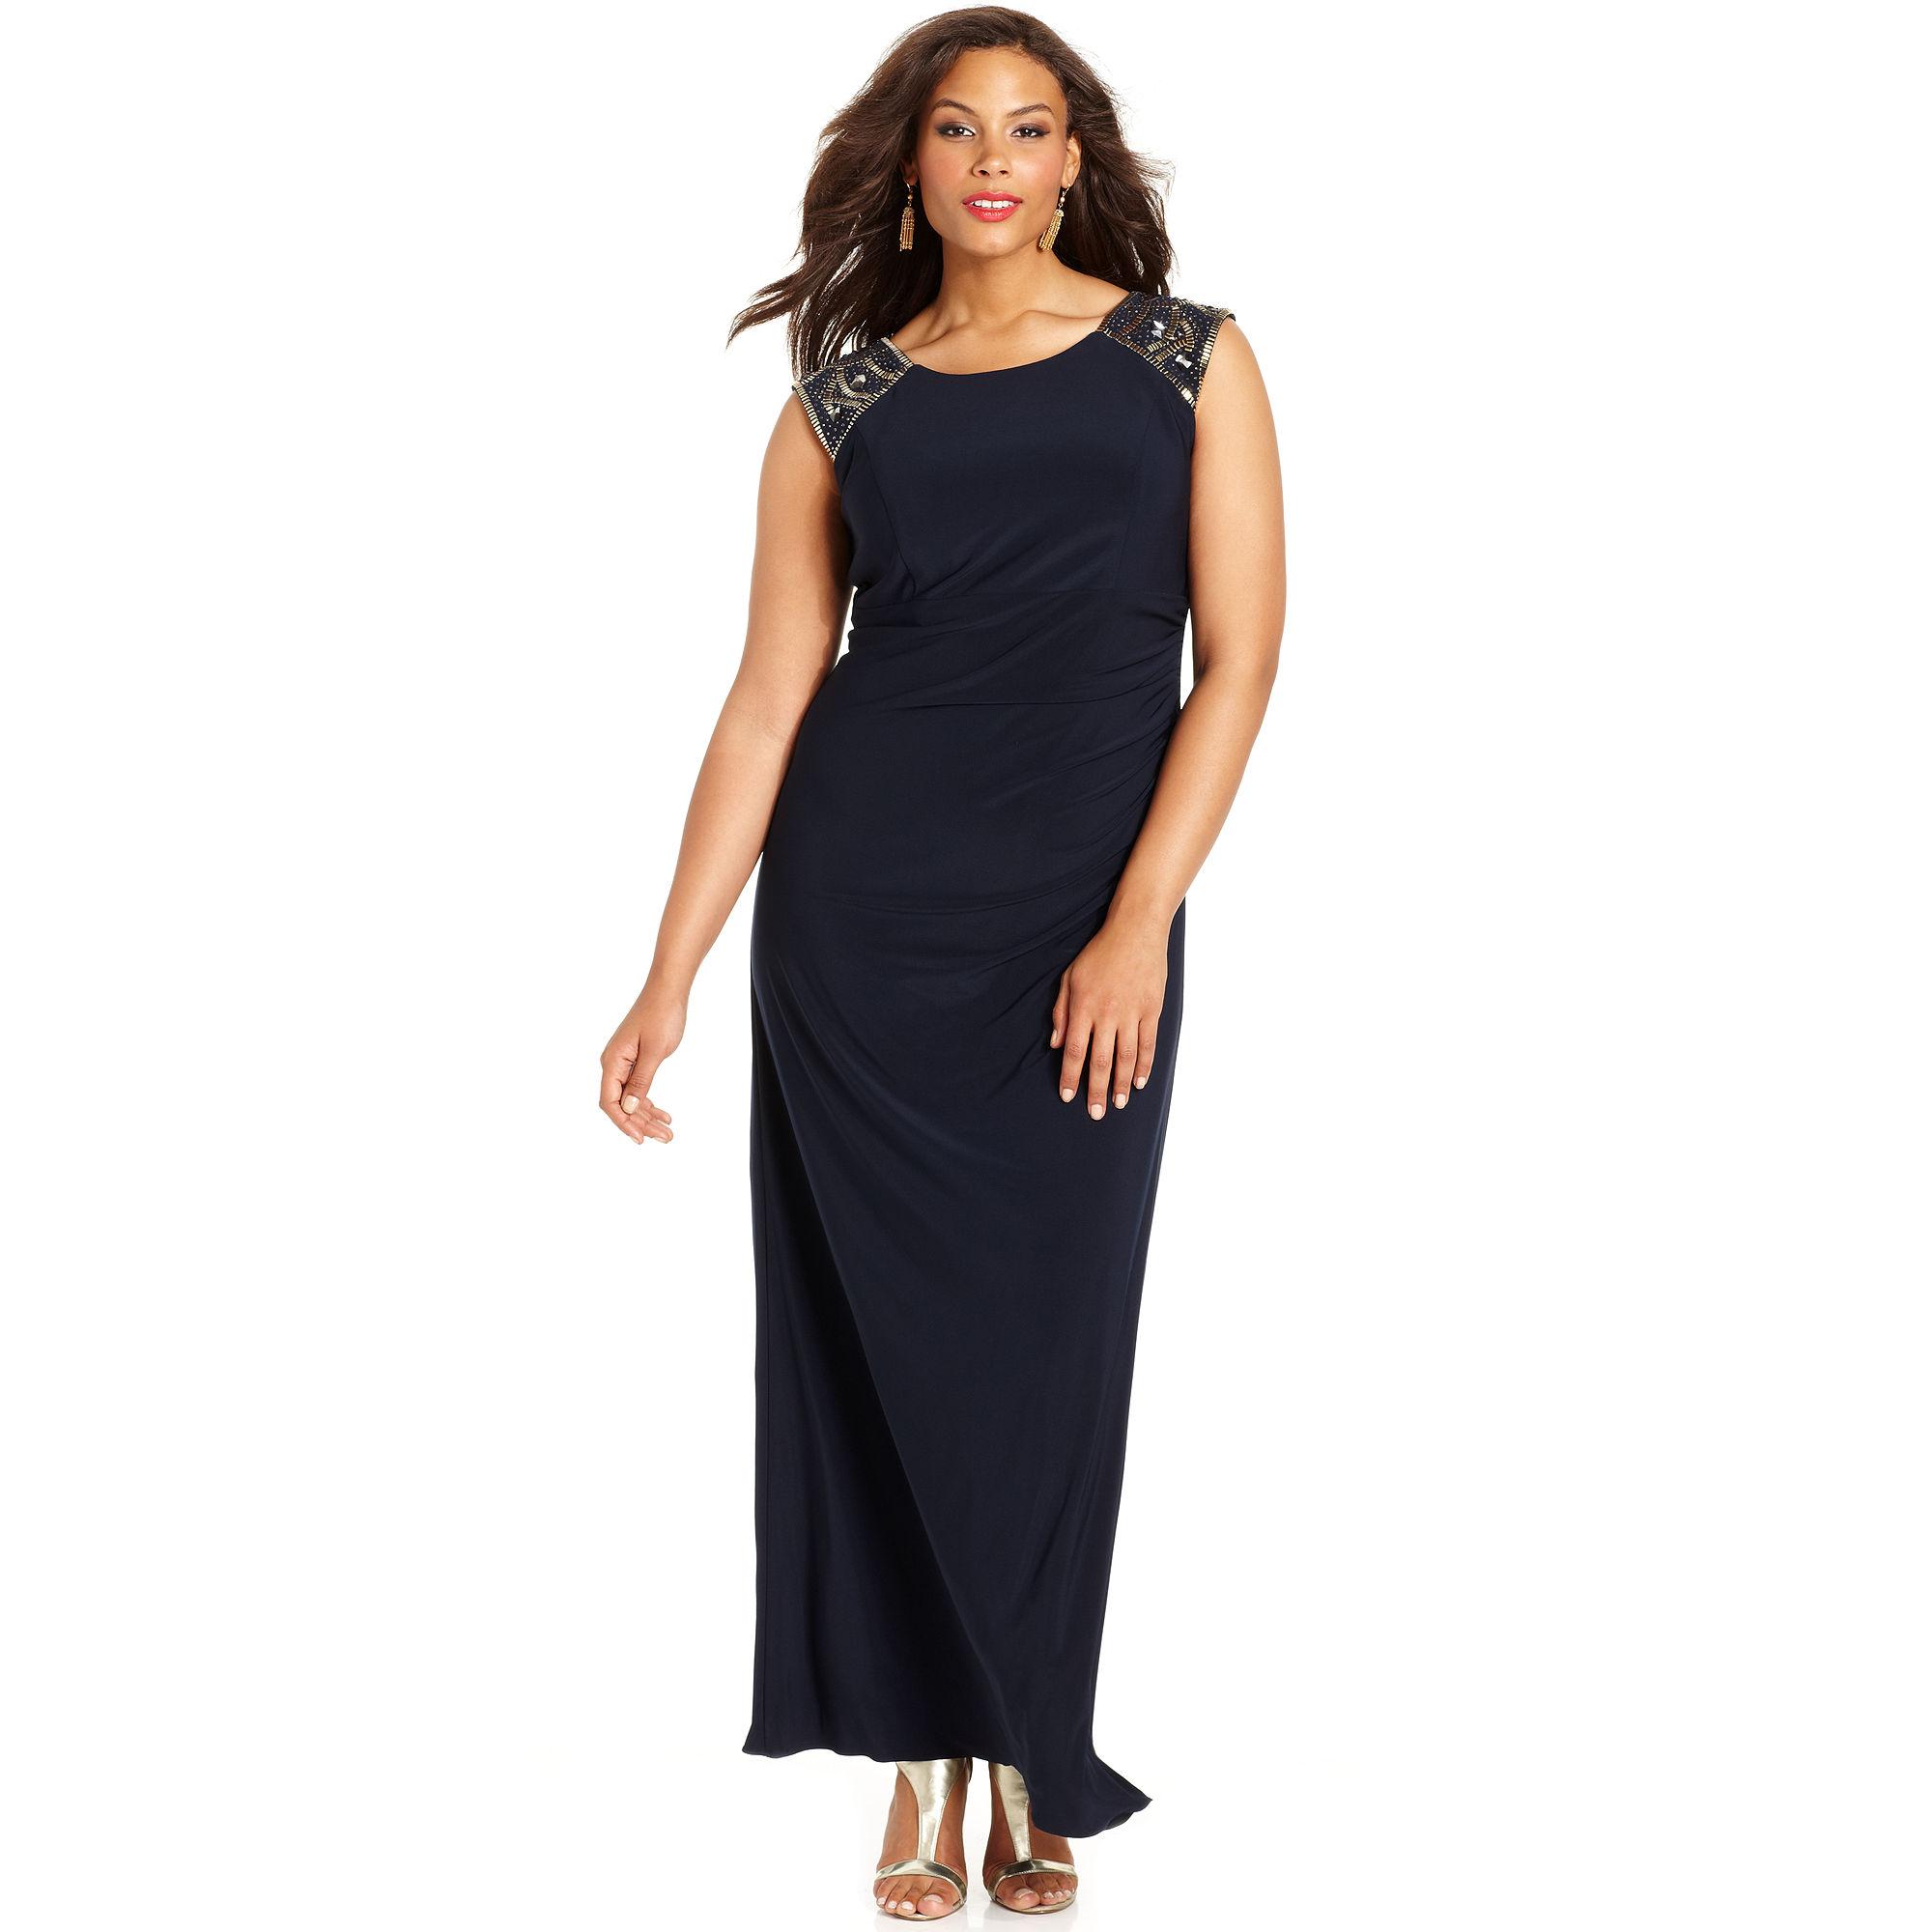 Xscape Xscape Plus Size Dress Capsleeve Beaded Gown In